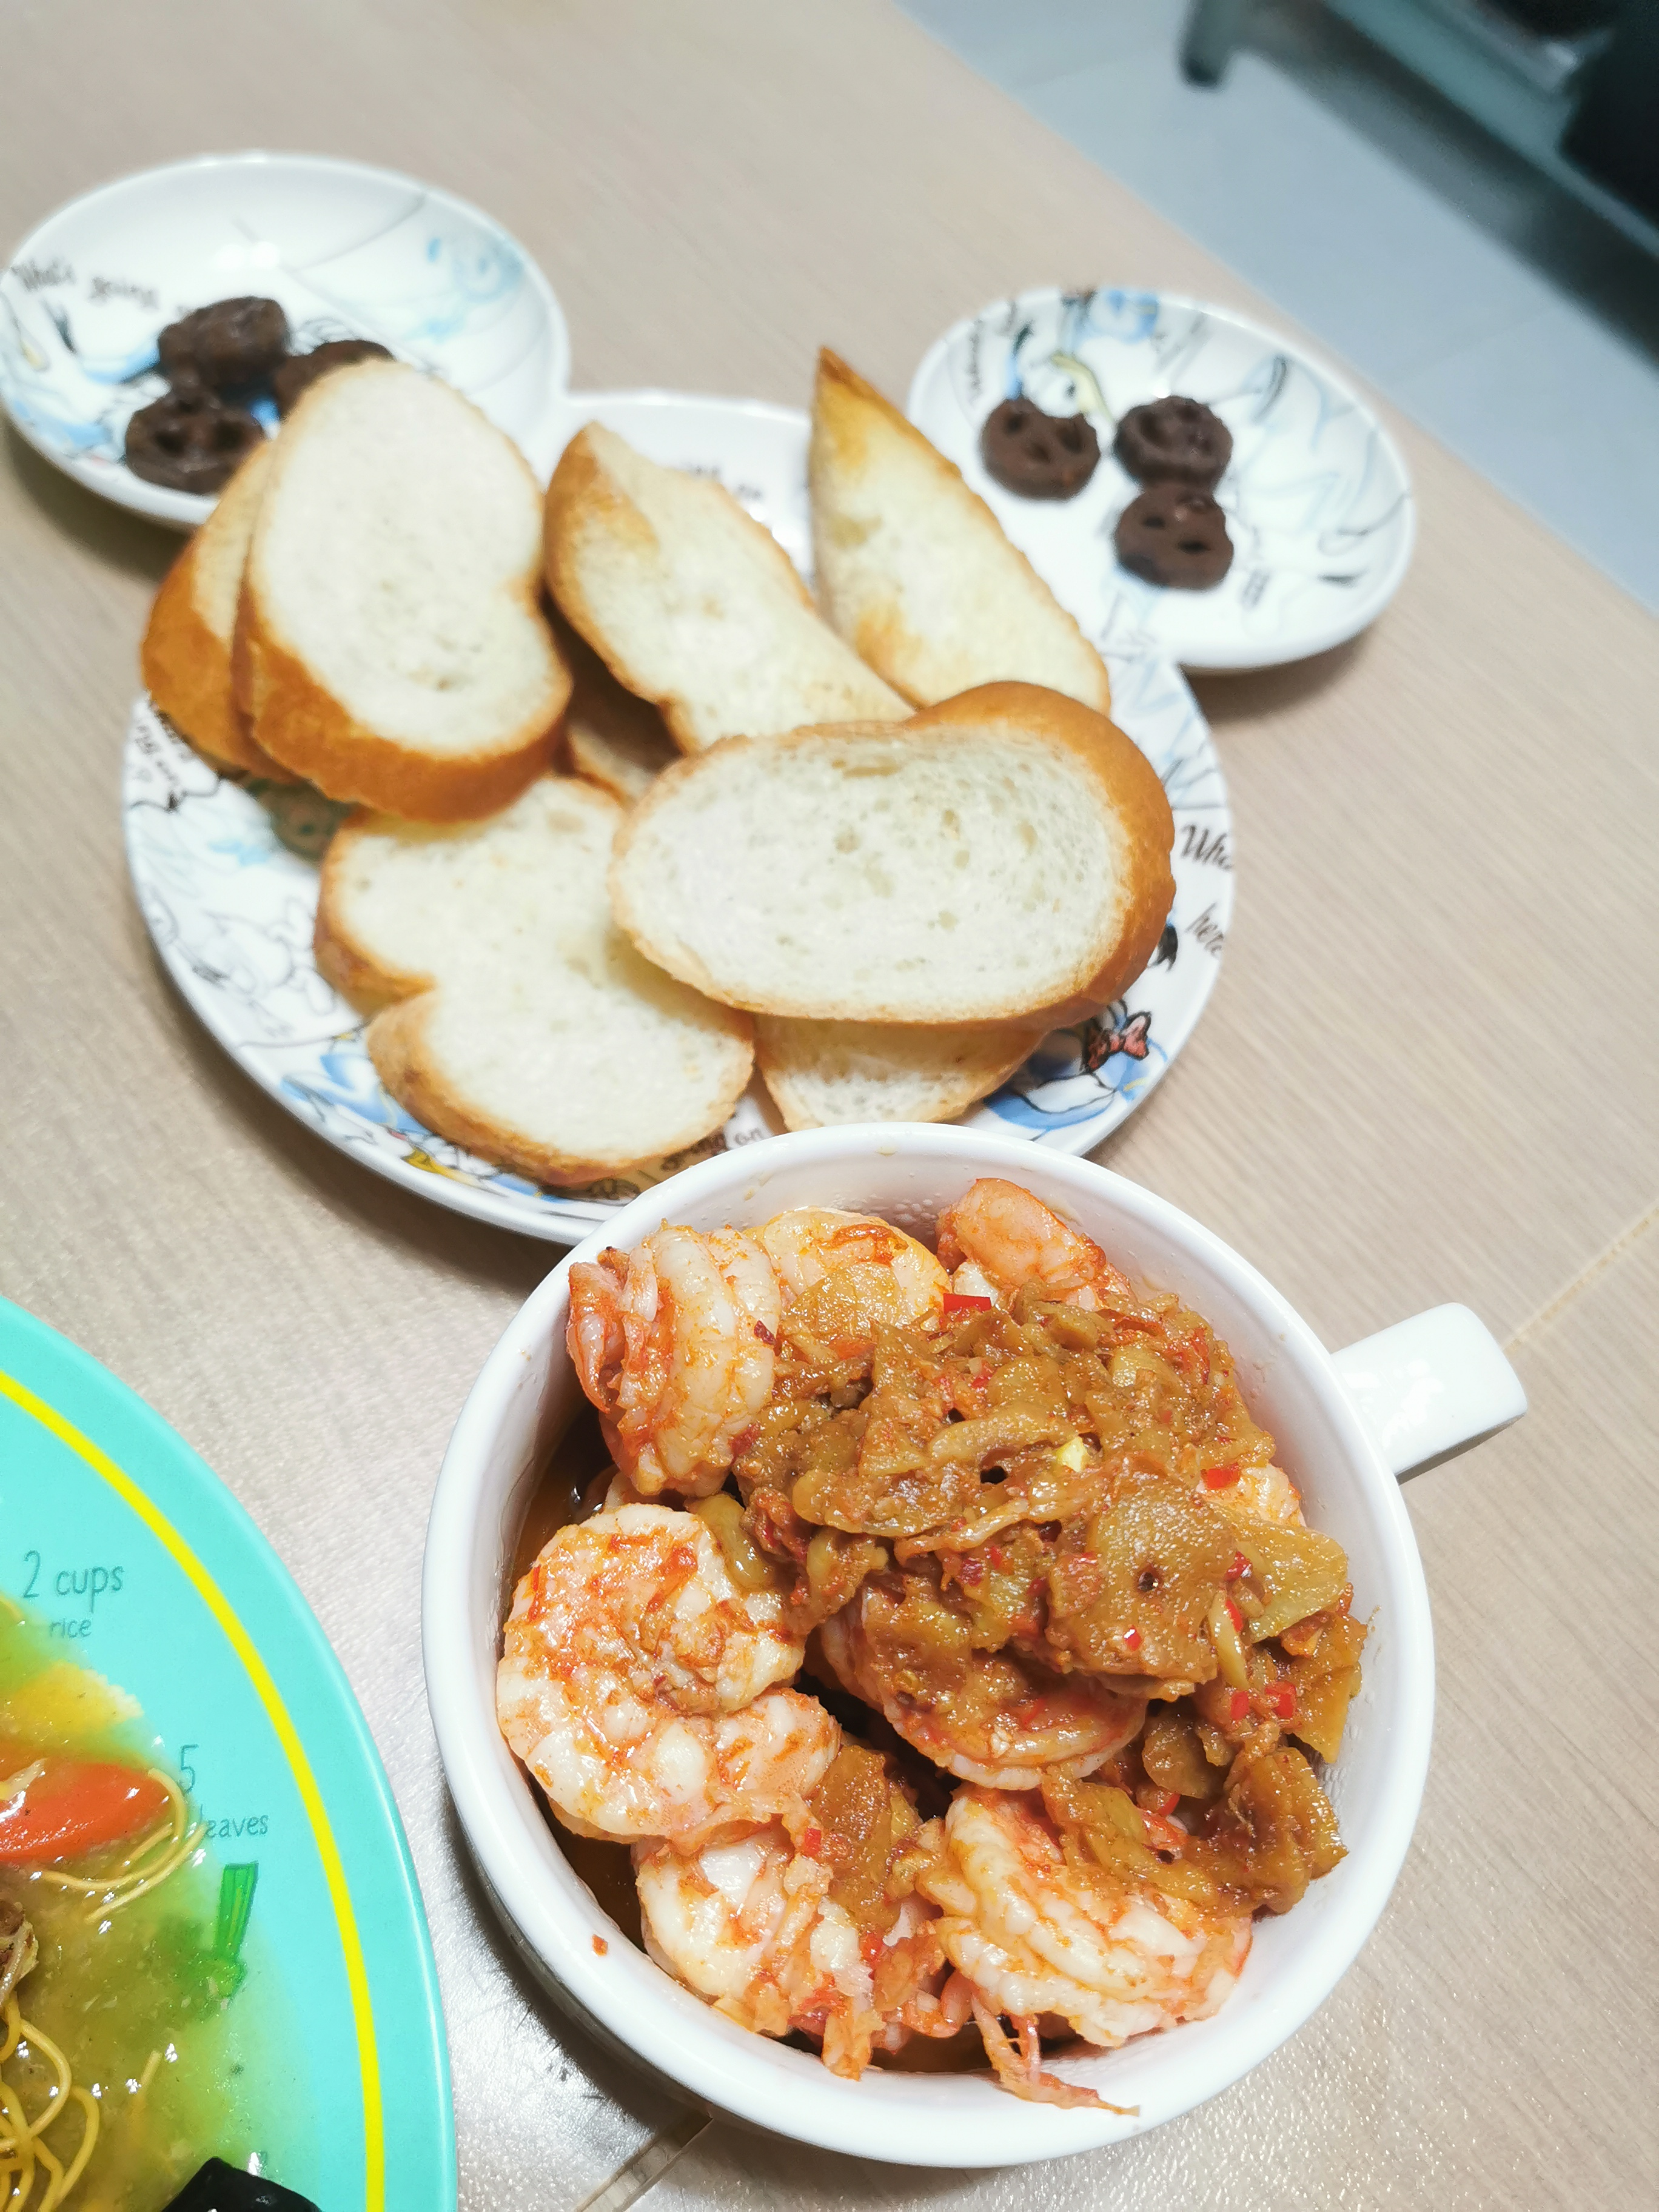 Spanish Garlic Shrimp (Gambas al Ajillo) Alicia Lau